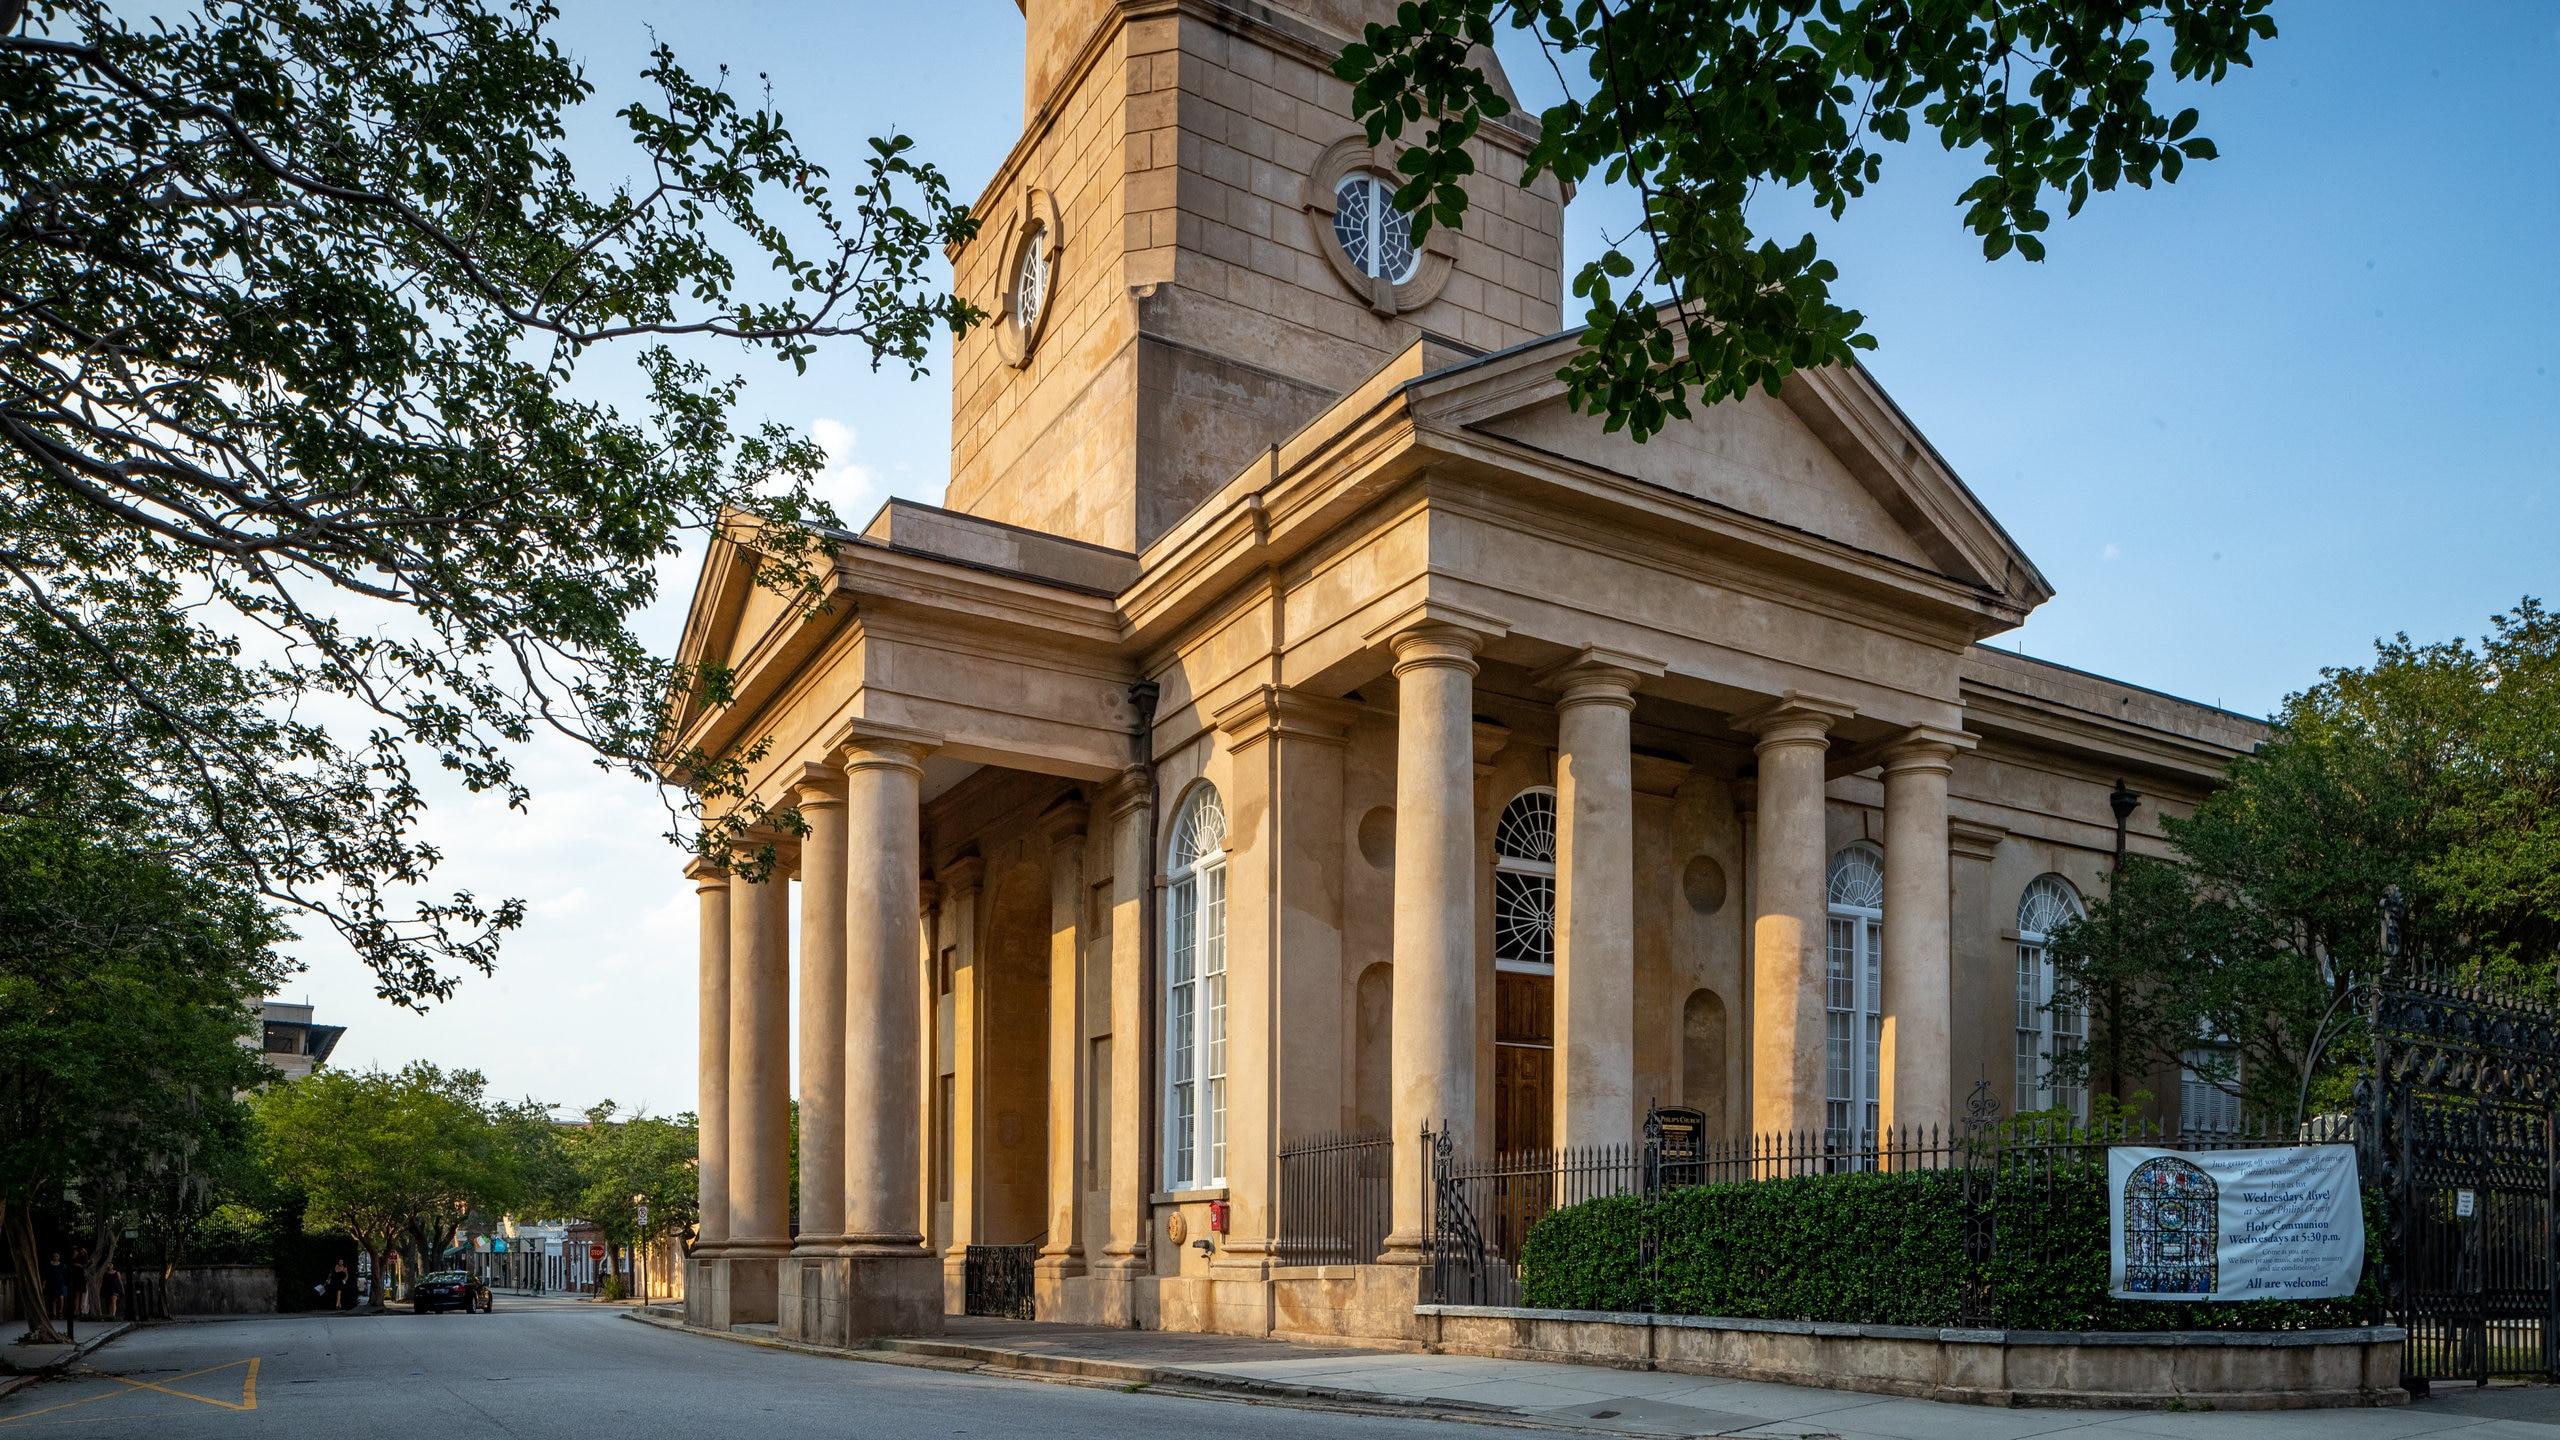 St. Philip's Church, Charleston, South Carolina, United States of America